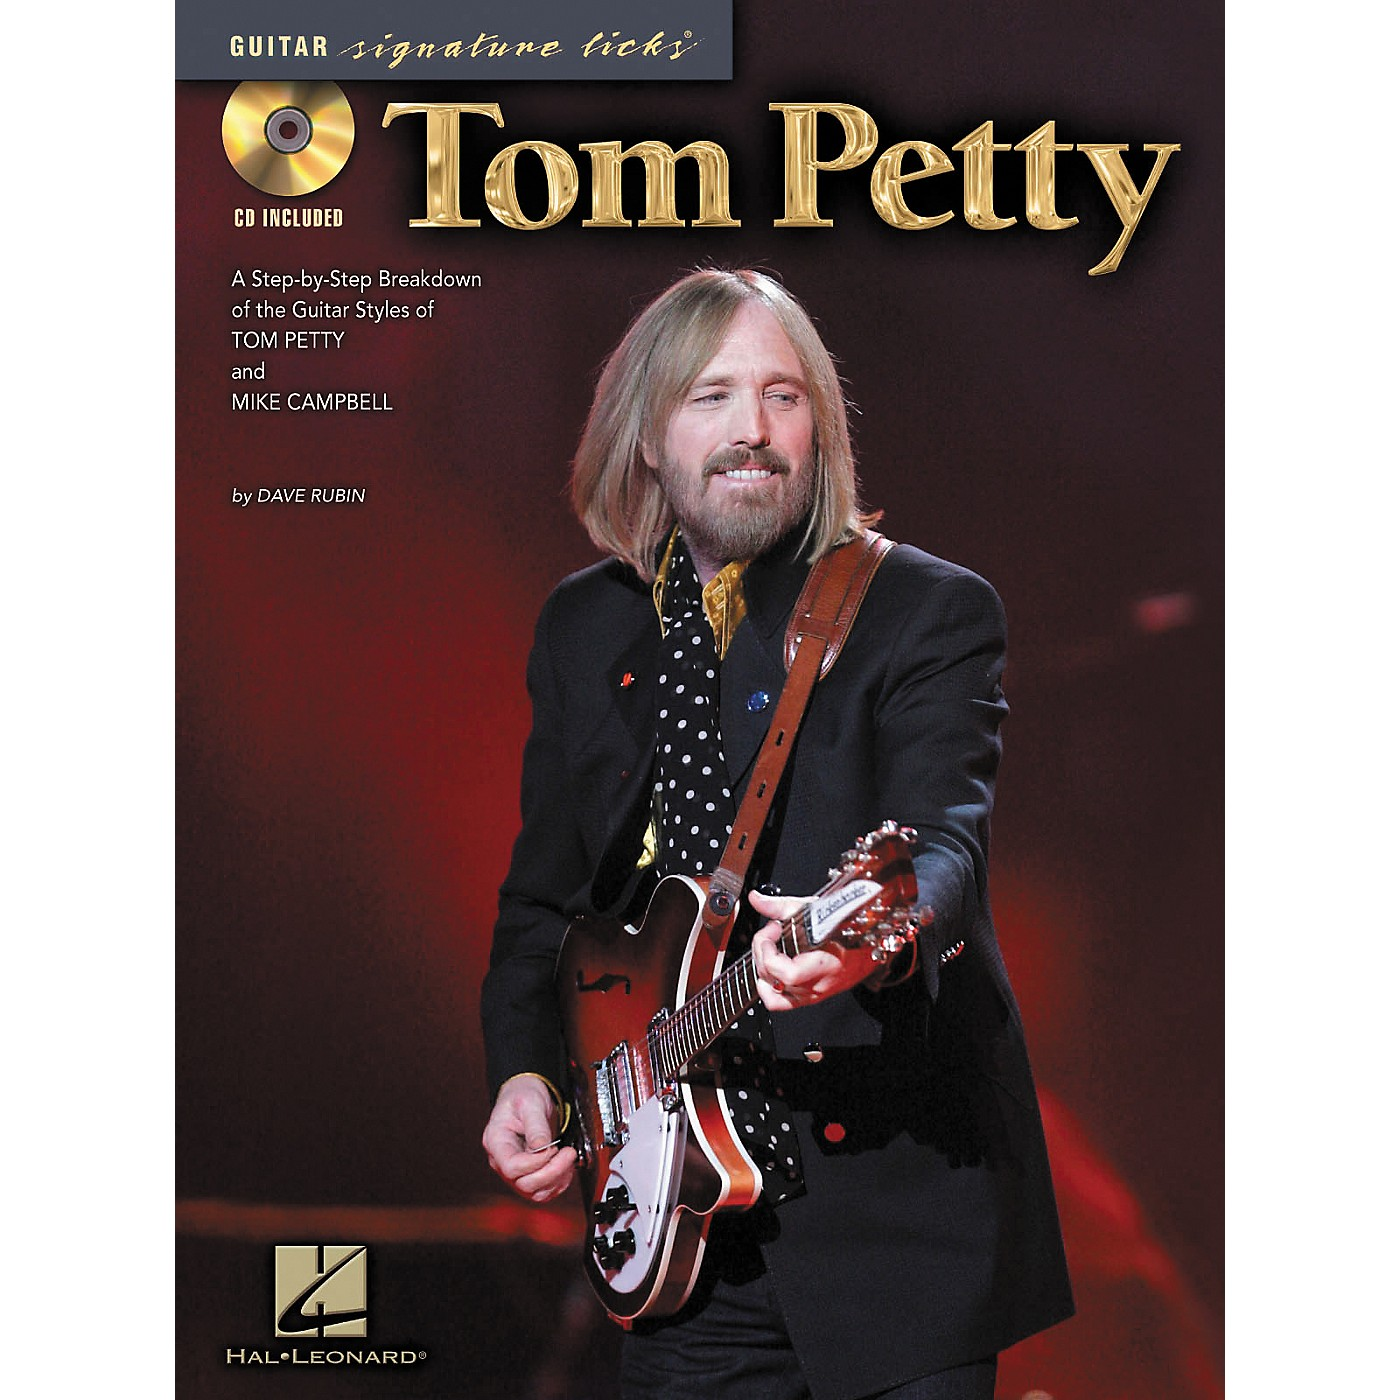 Hal Leonard Tom Petty - Guitar Signature Licks (Book/CD) thumbnail